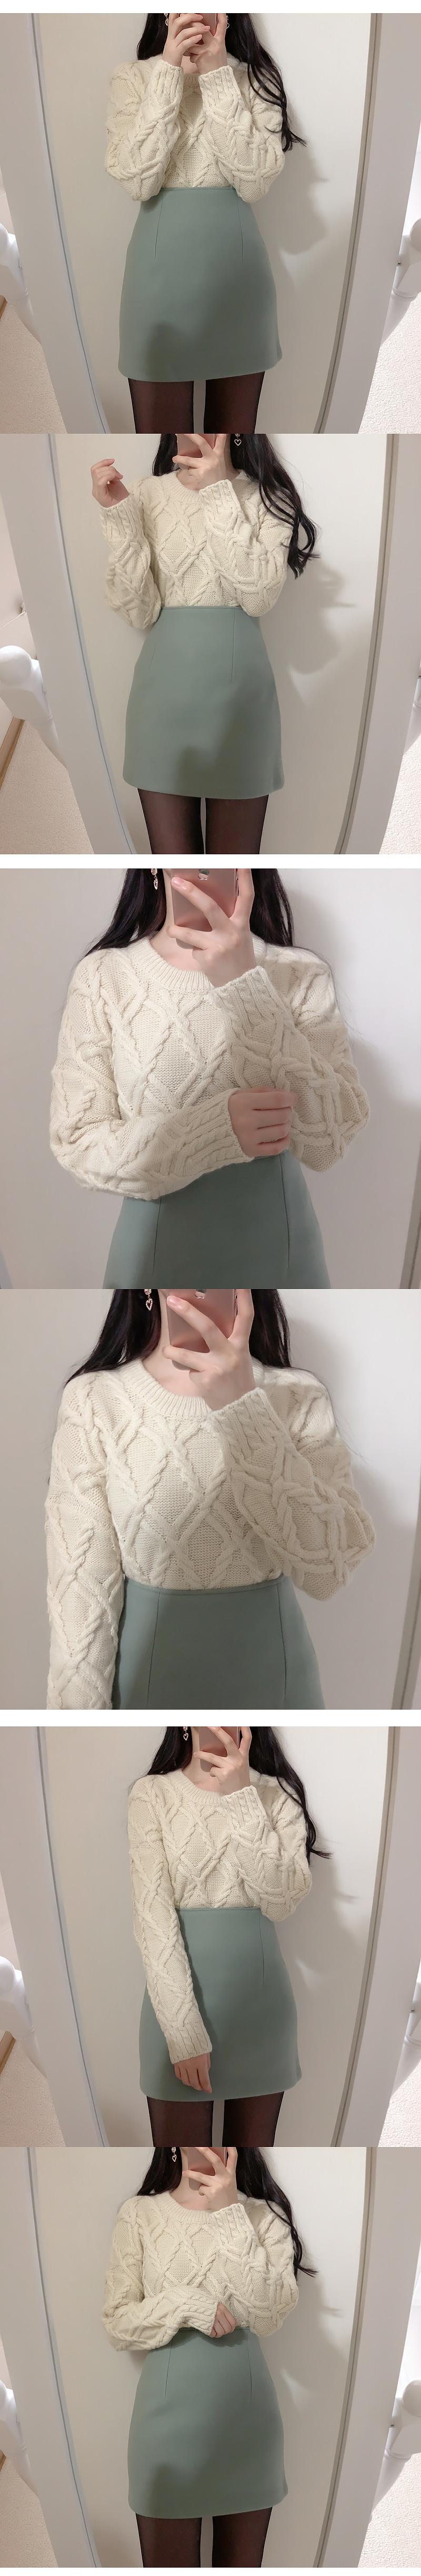 Lollipop pretzel knit